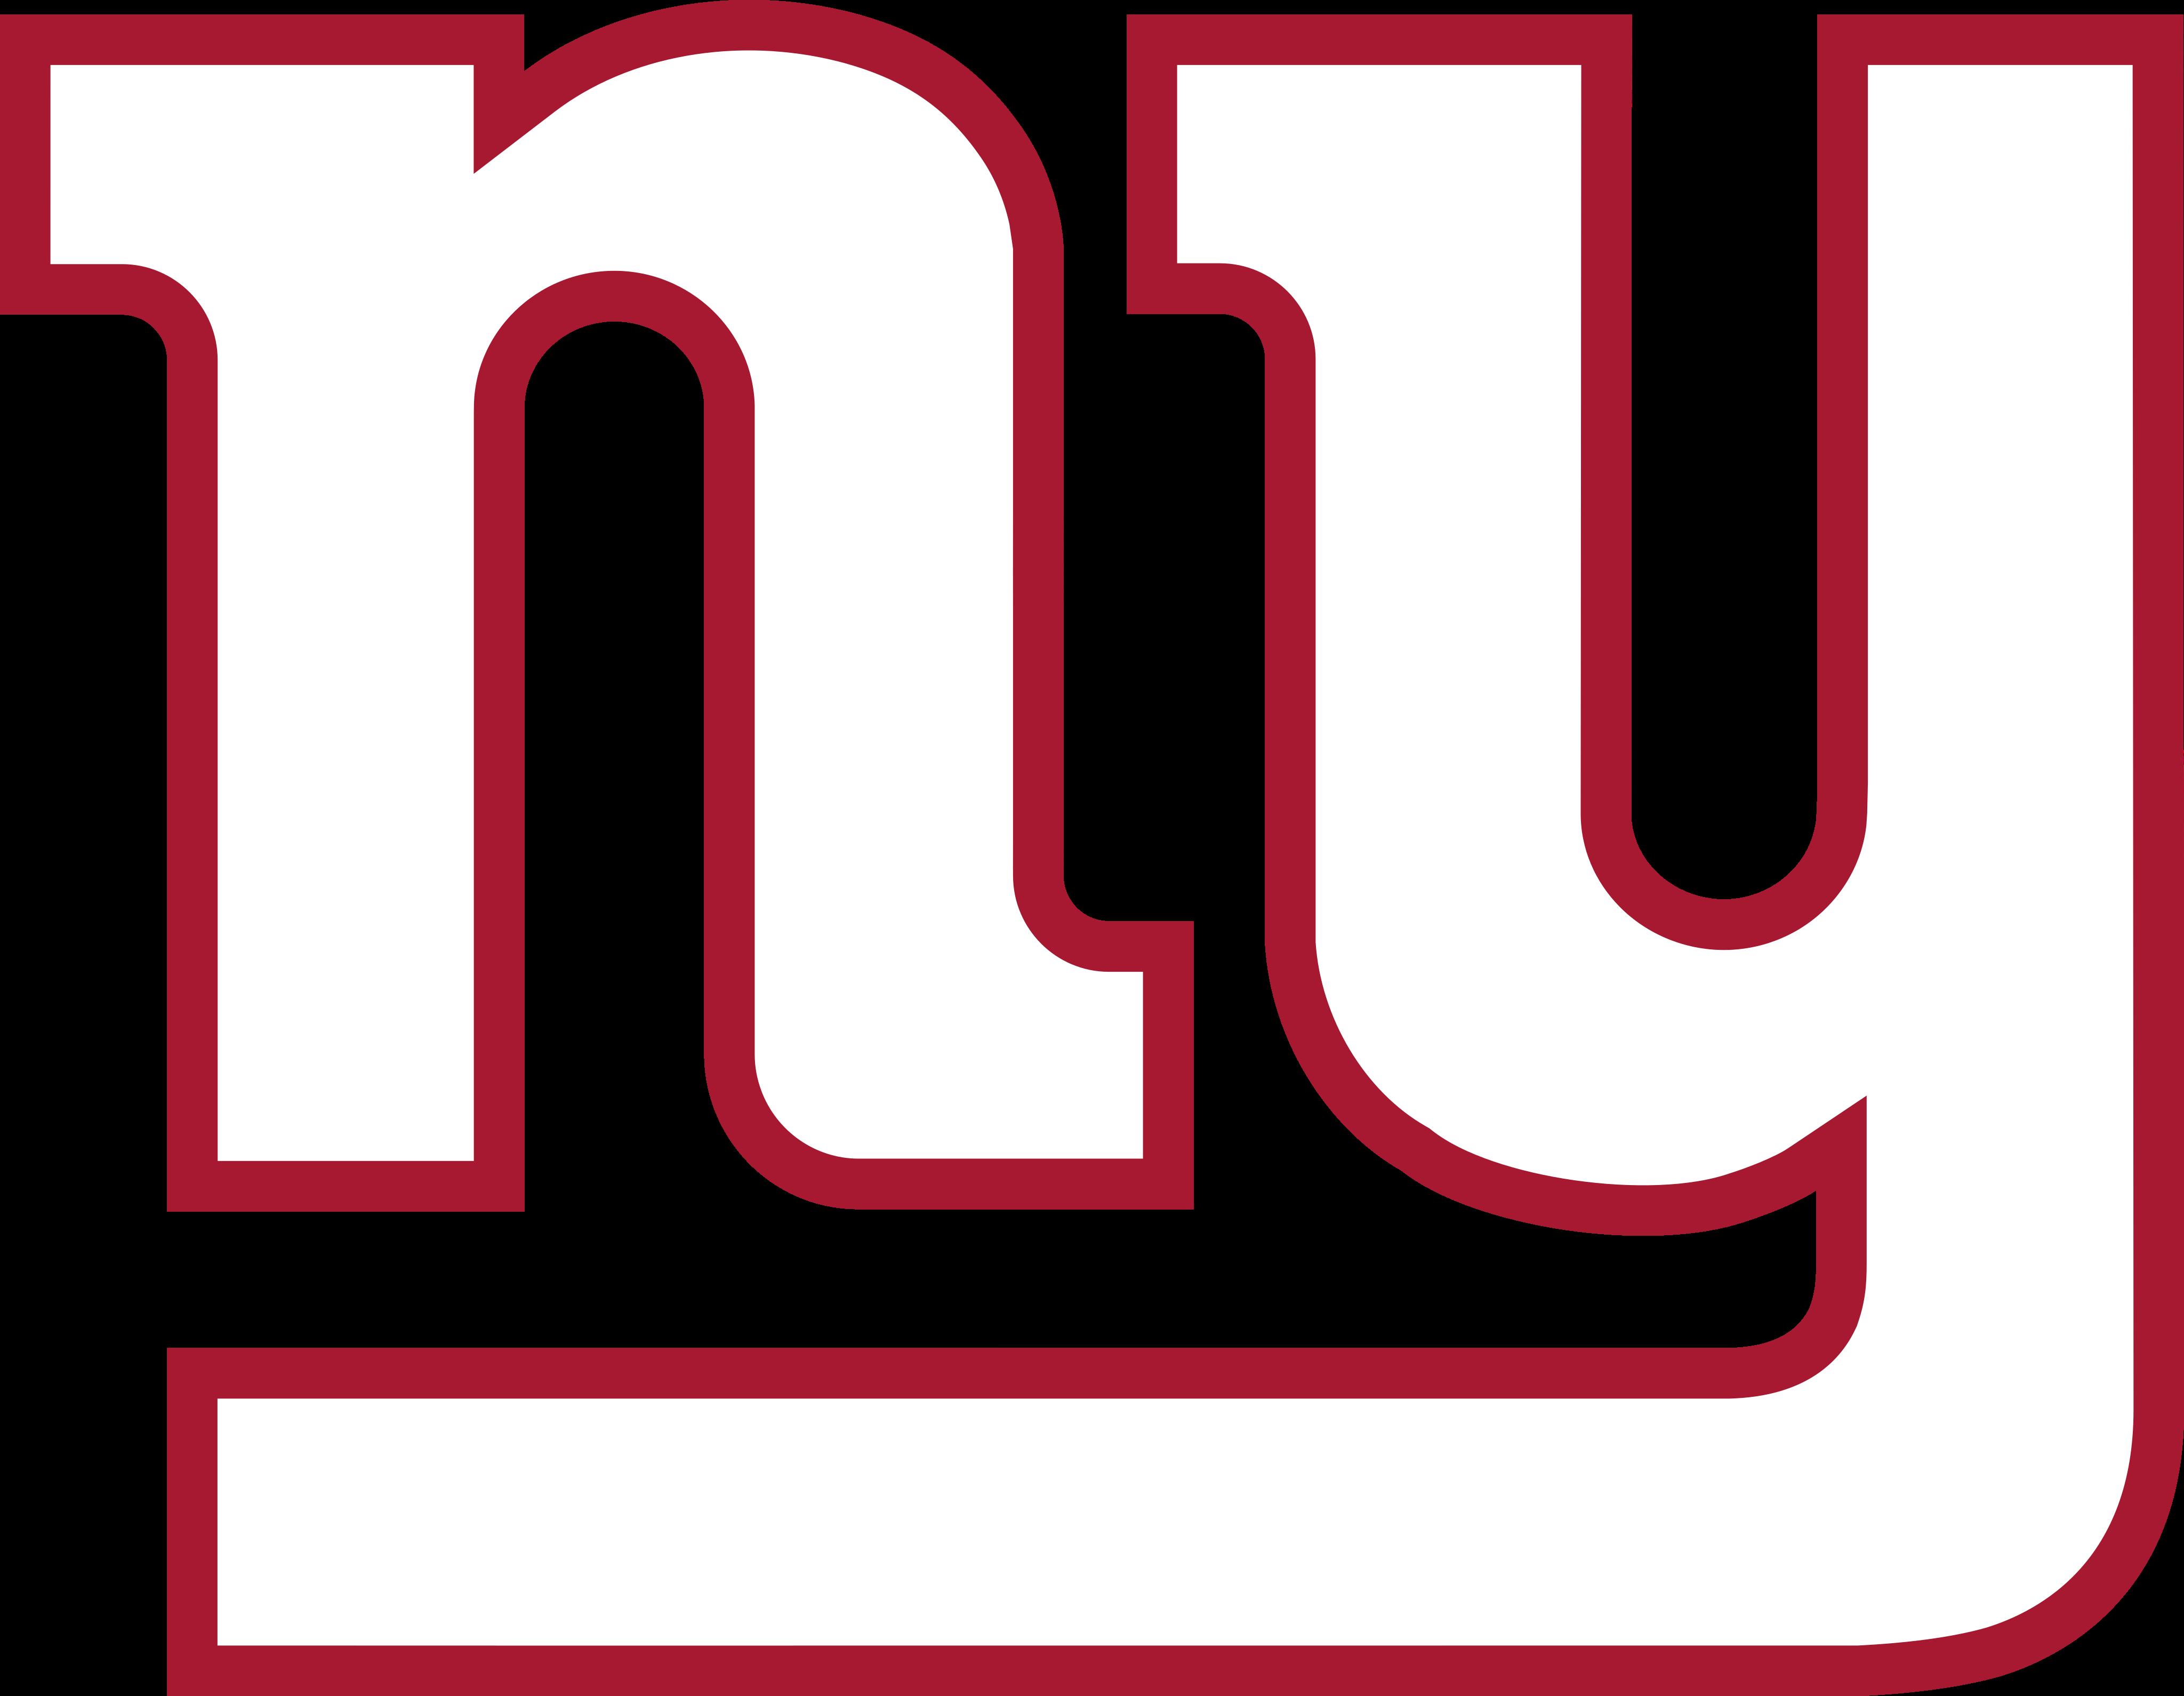 new york giants logo 1 - New York Giants Logo